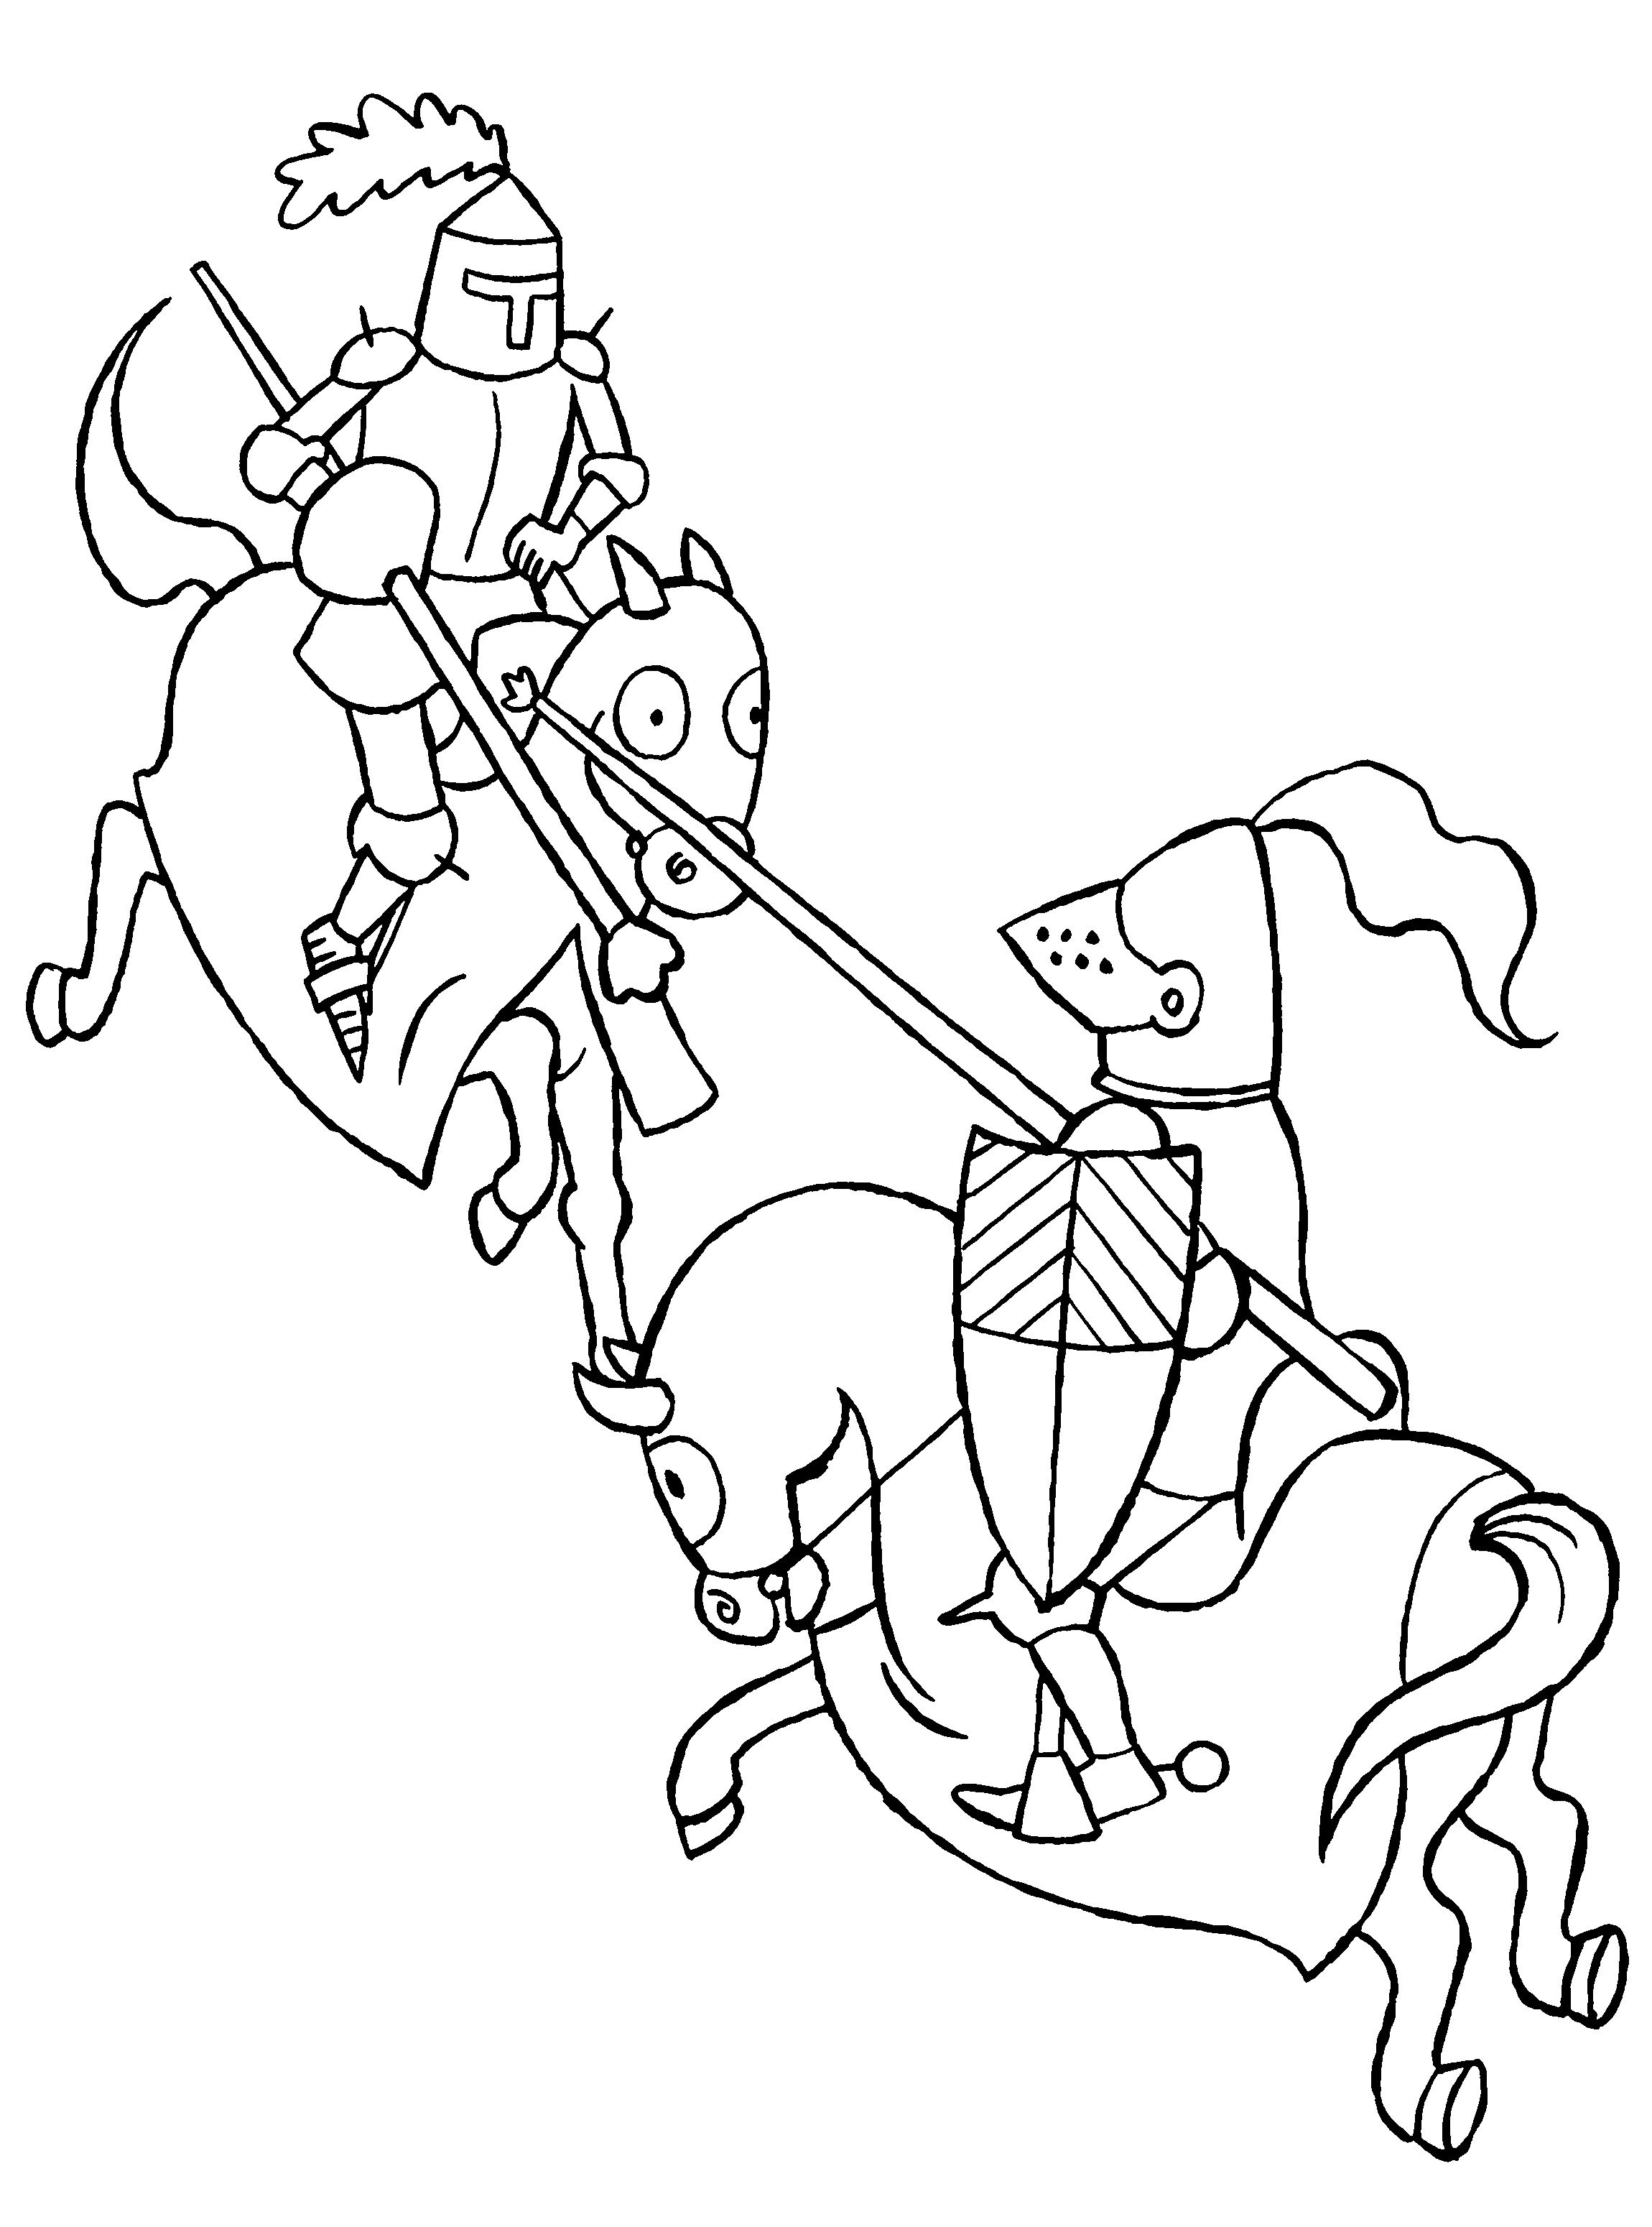 Kleurplaten Ridder Op Paard.Twee Vechtende Ridders Te Paard Ridders Kleurplaten En